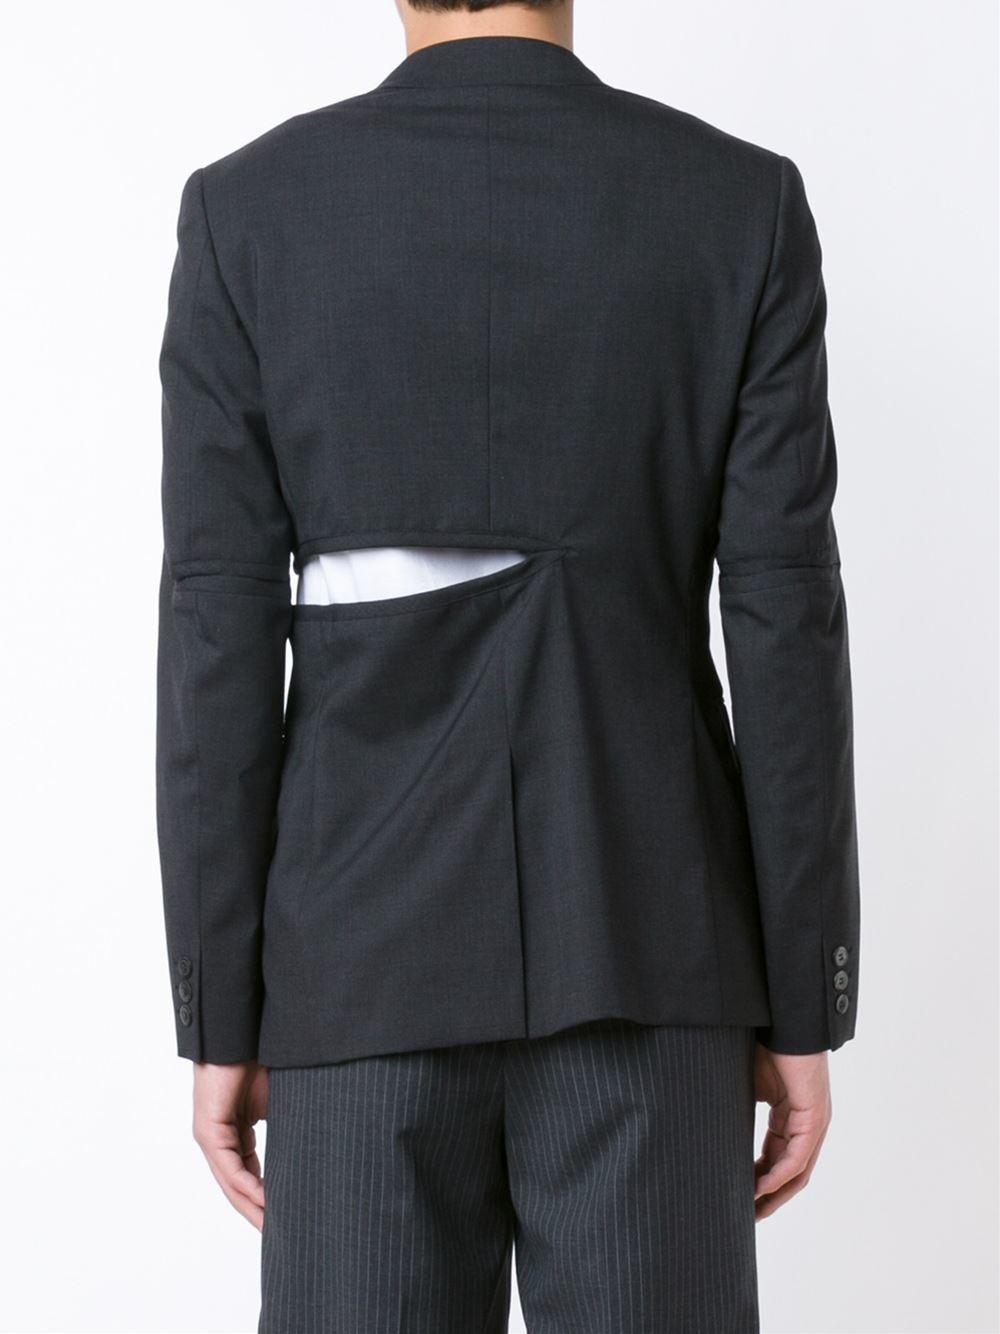 Comme des Garçons Wool Single-breasted Blazer Jacket in Grey (Grey) for Men